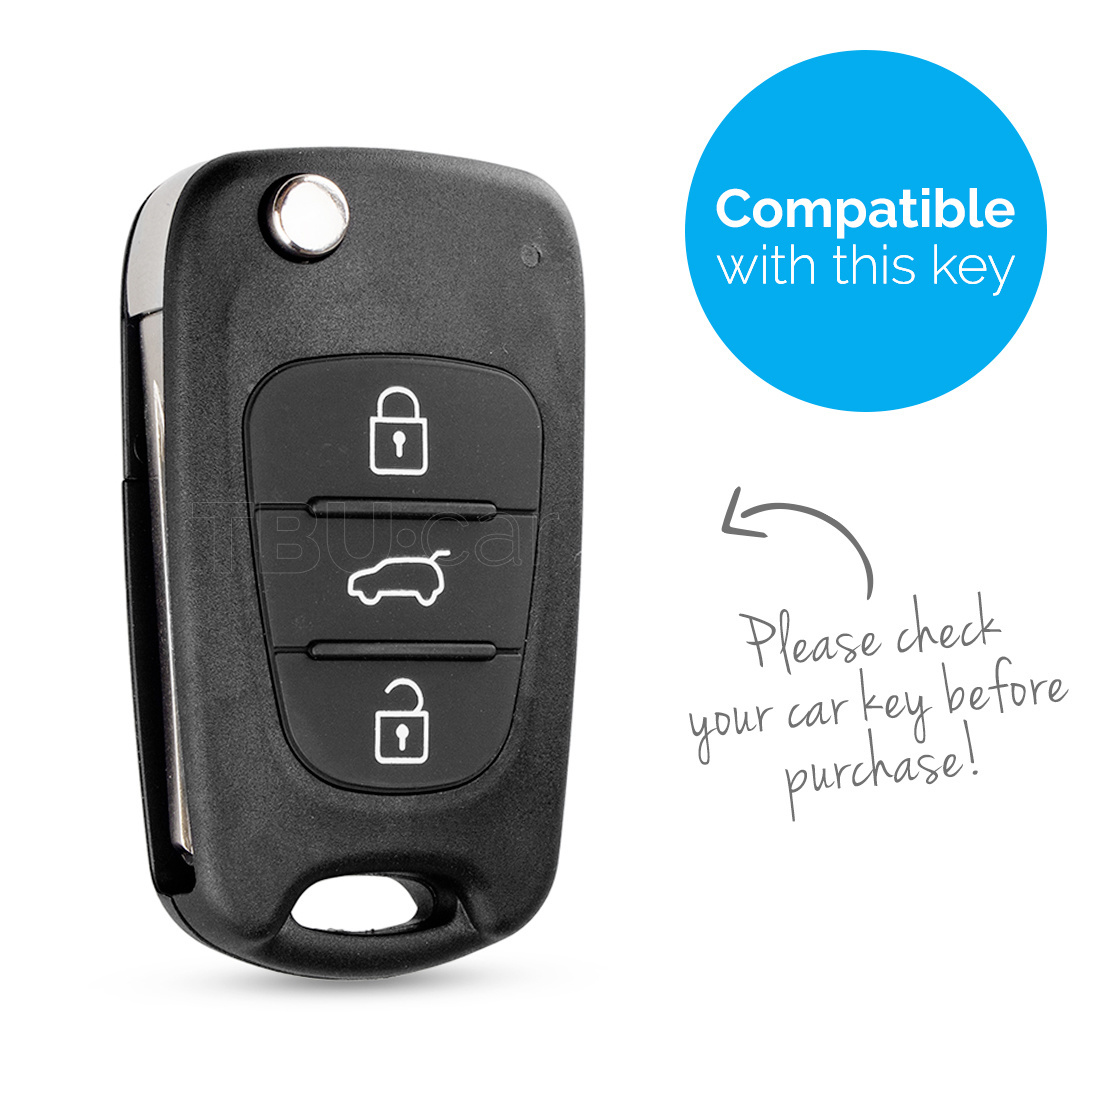 TBU car TBU car Autoschlüssel Hülle kompatibel mit Hyundai 3 Tasten - Schutzhülle aus TPU - Auto Schlüsselhülle Cover in Silber Chrom